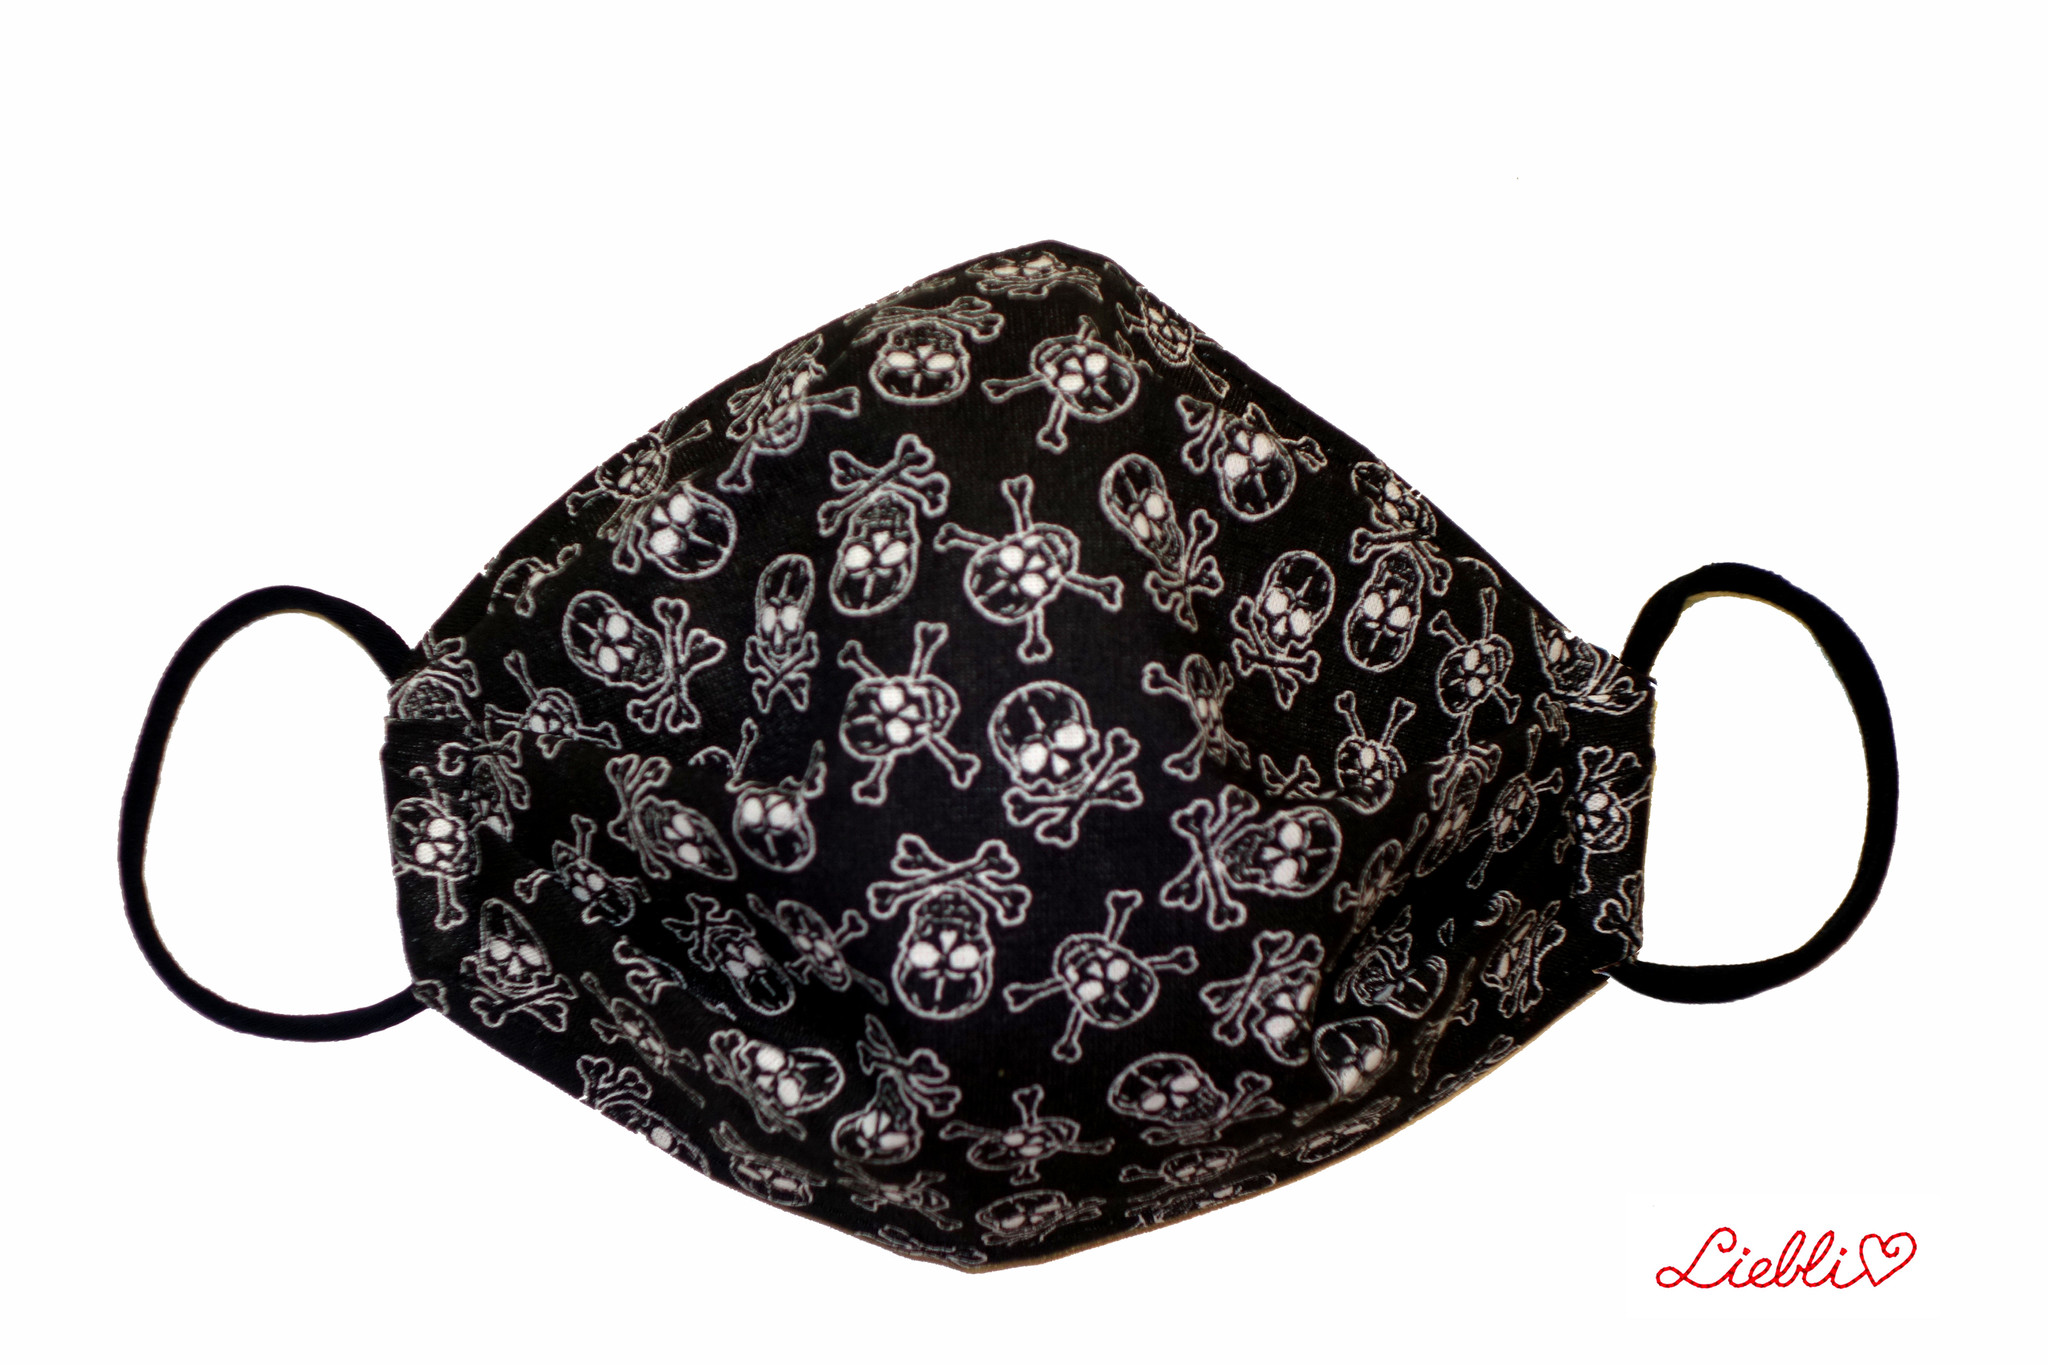 Coole Masken, Stoffmaske mit Totenköpfe, Totenkopf Maske  schwarz